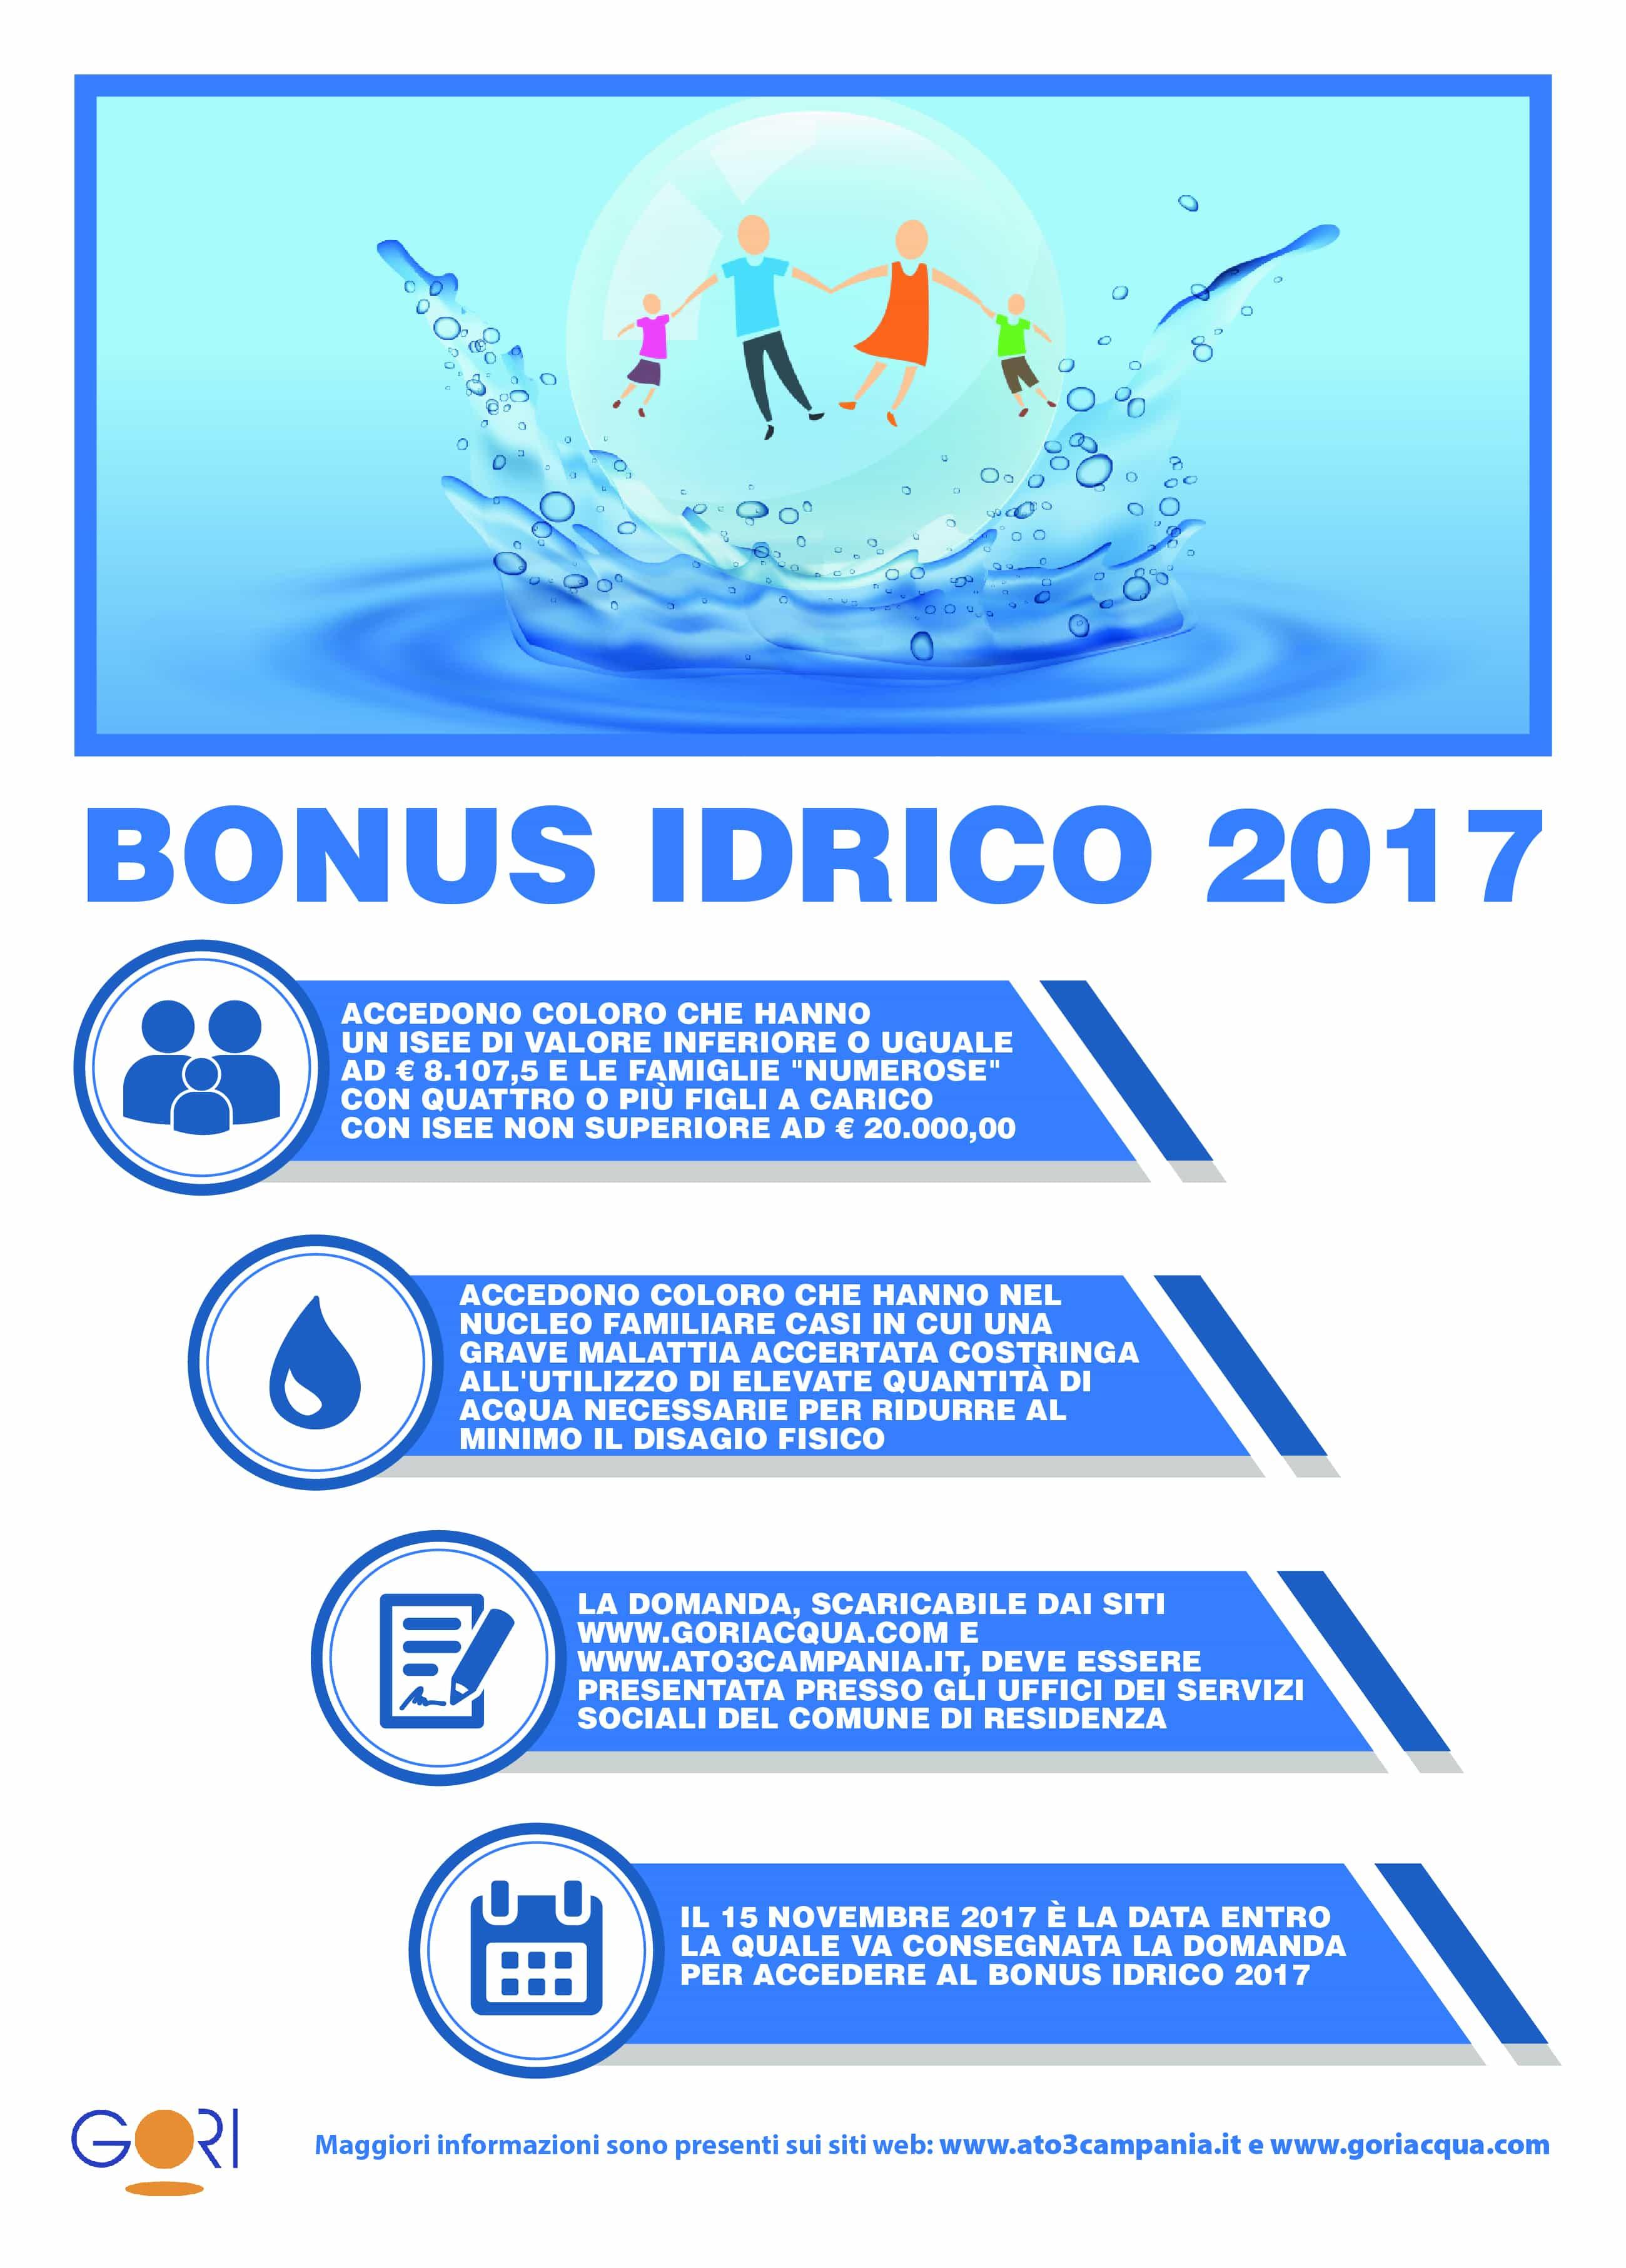 Gori Bonus Idrico 2017